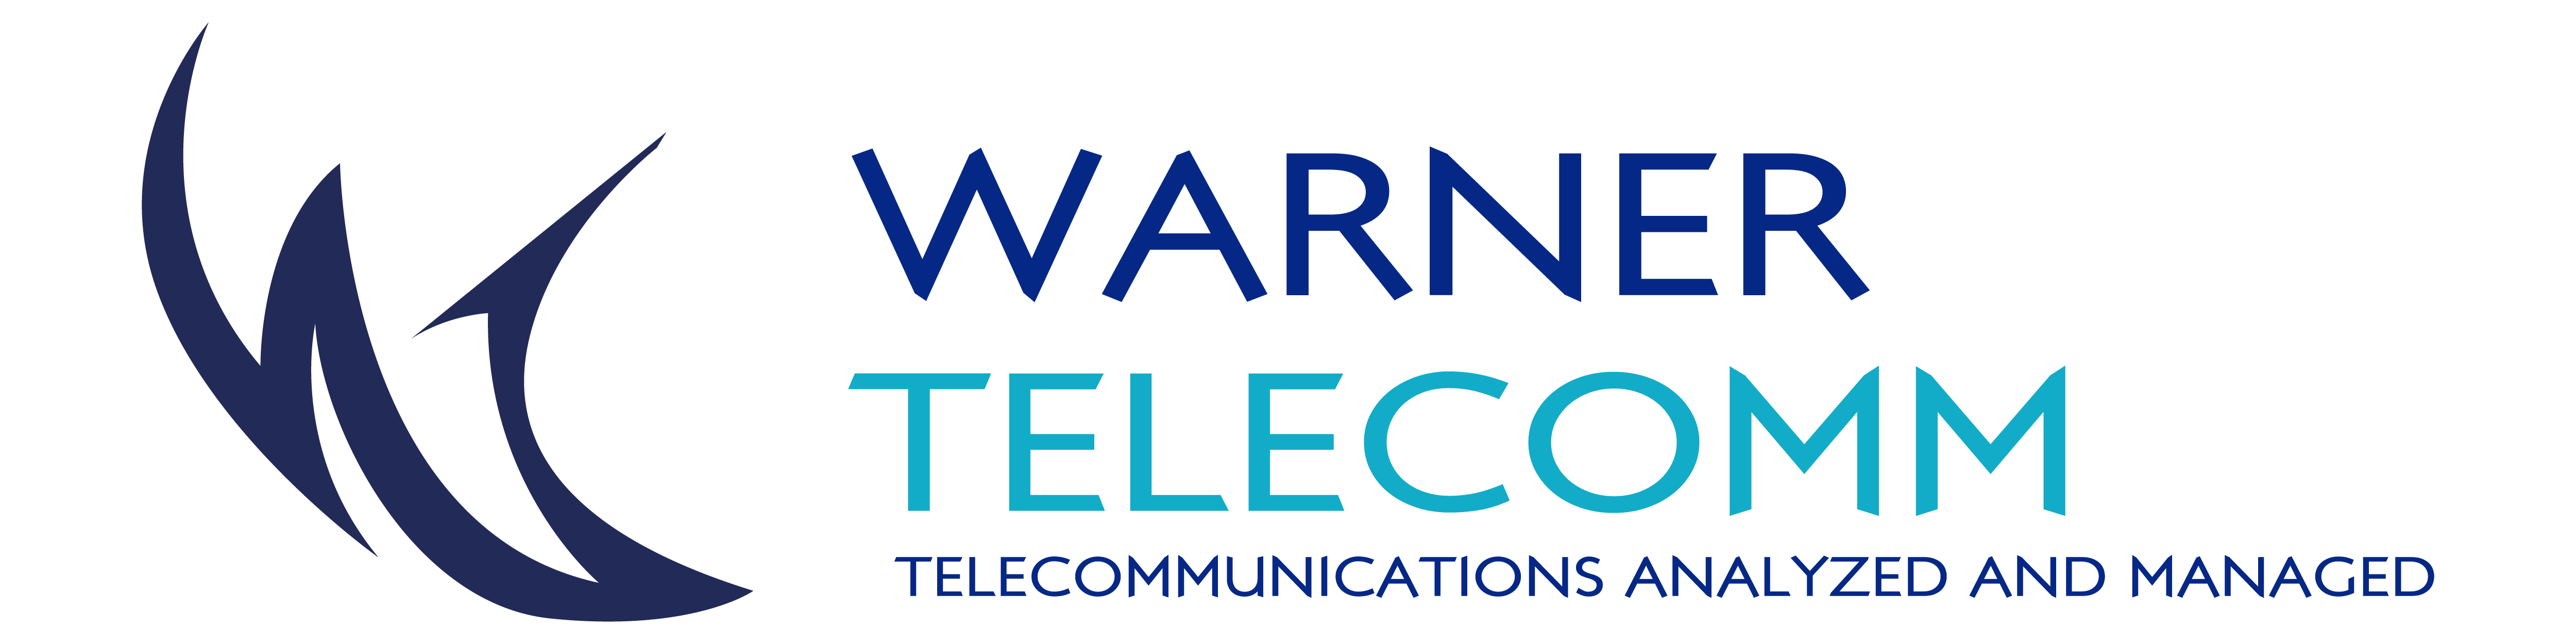 Warner Telecomm